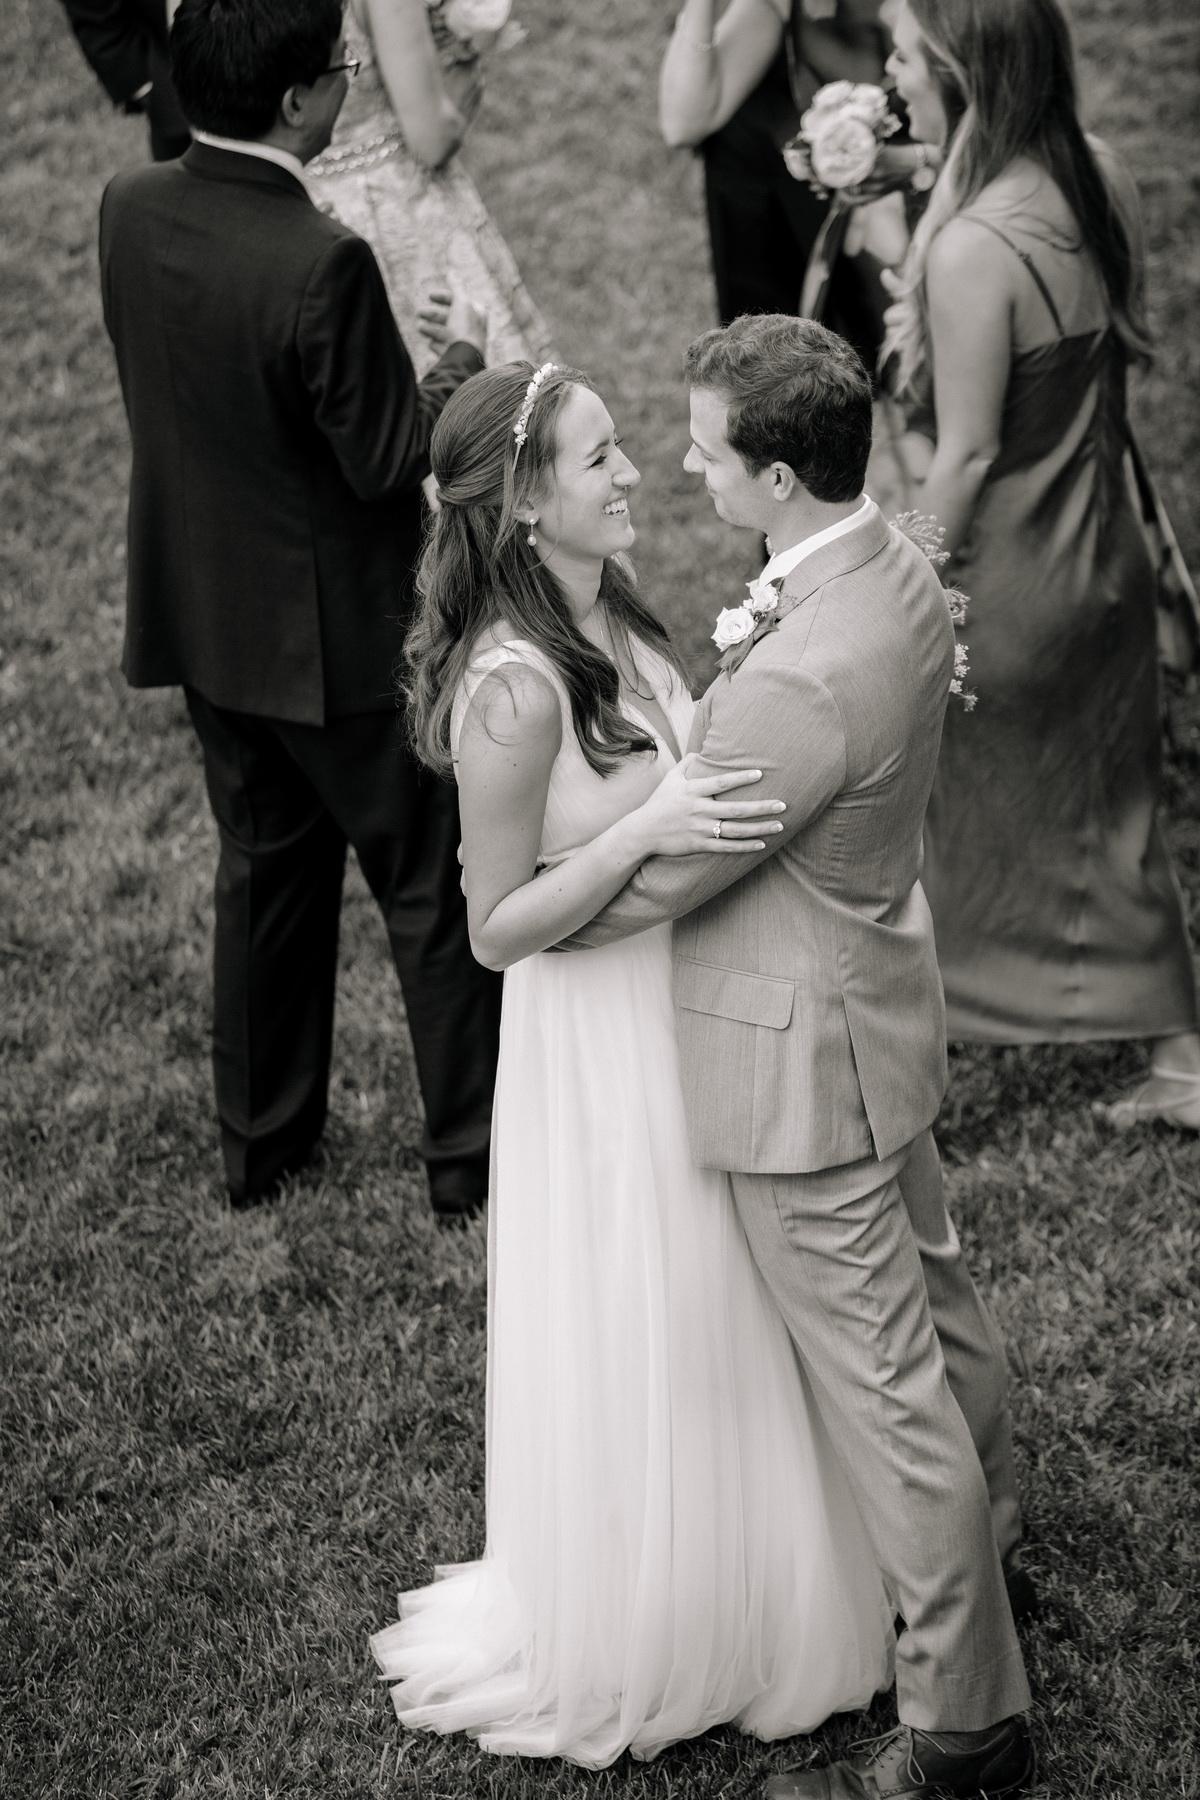 bride and groom at their backyard wedding reception